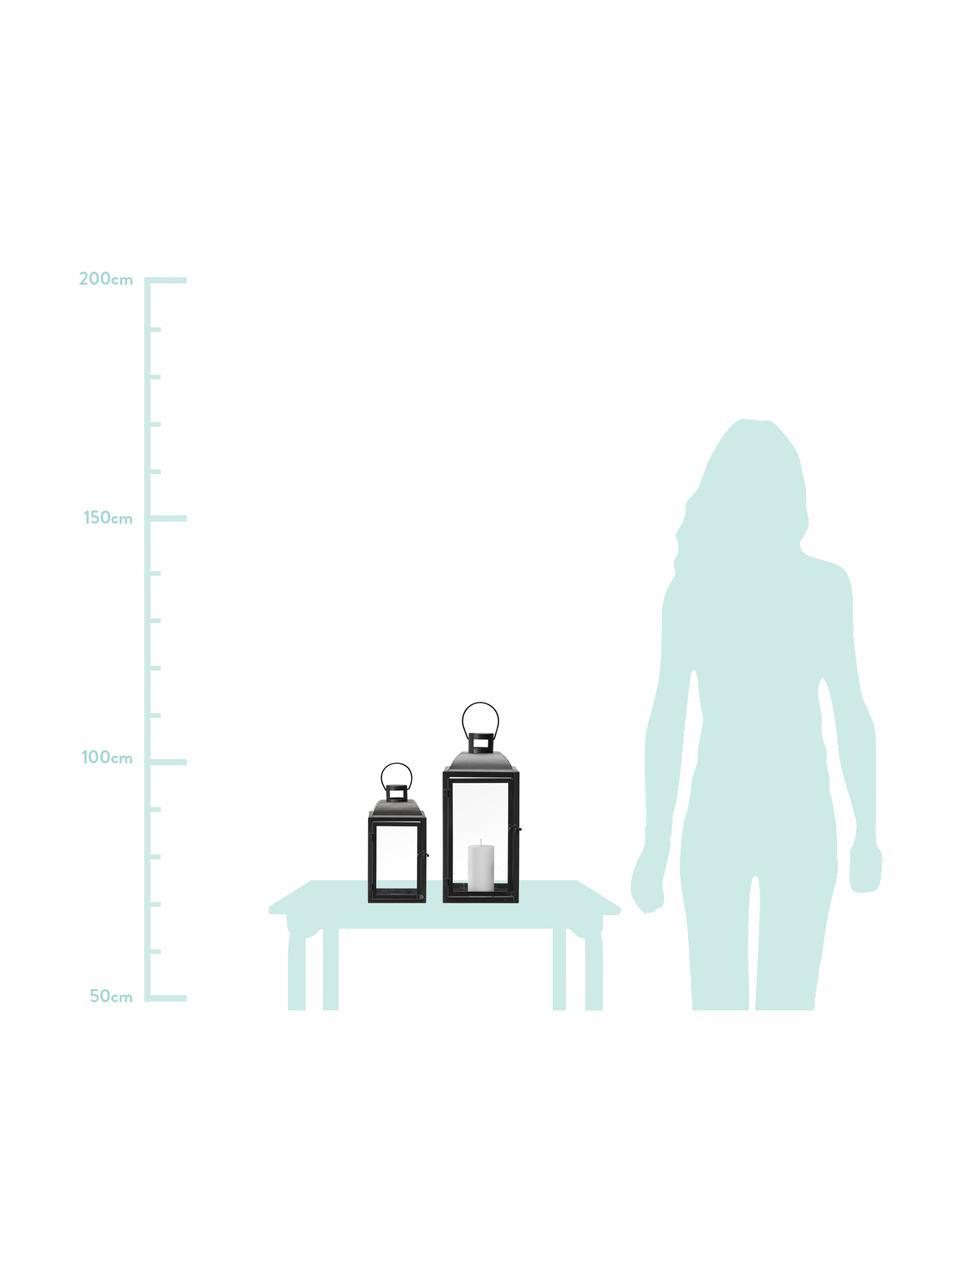 Komplet latarenek Polly, 2 elem., Stelaż: metal powlekany, Czarny, Komplet z różnymi rozmiarami